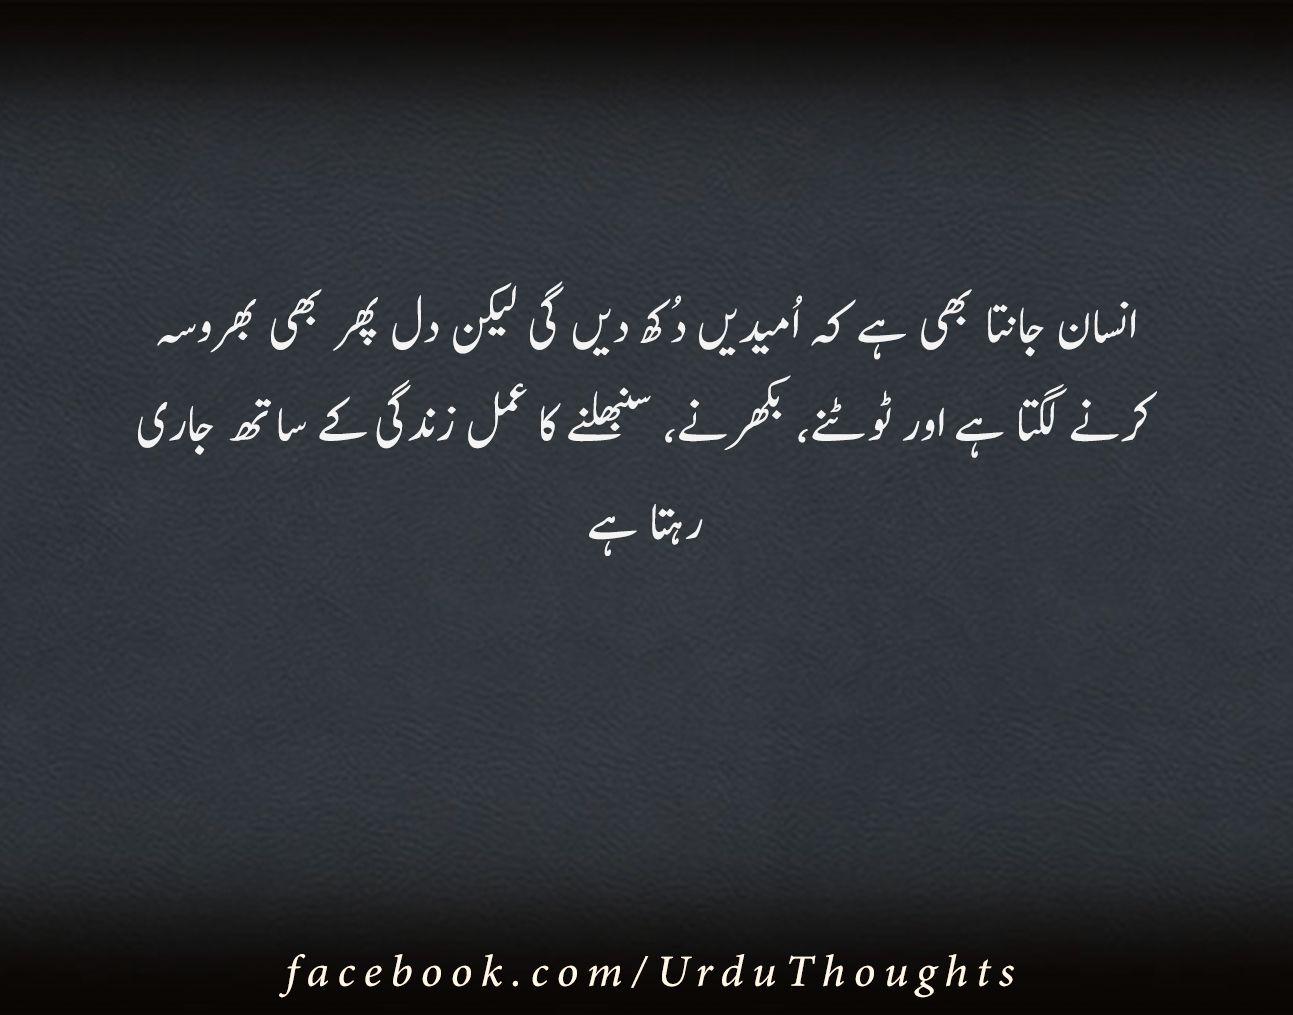 beautiful quotes in urdu for facebook Motivational